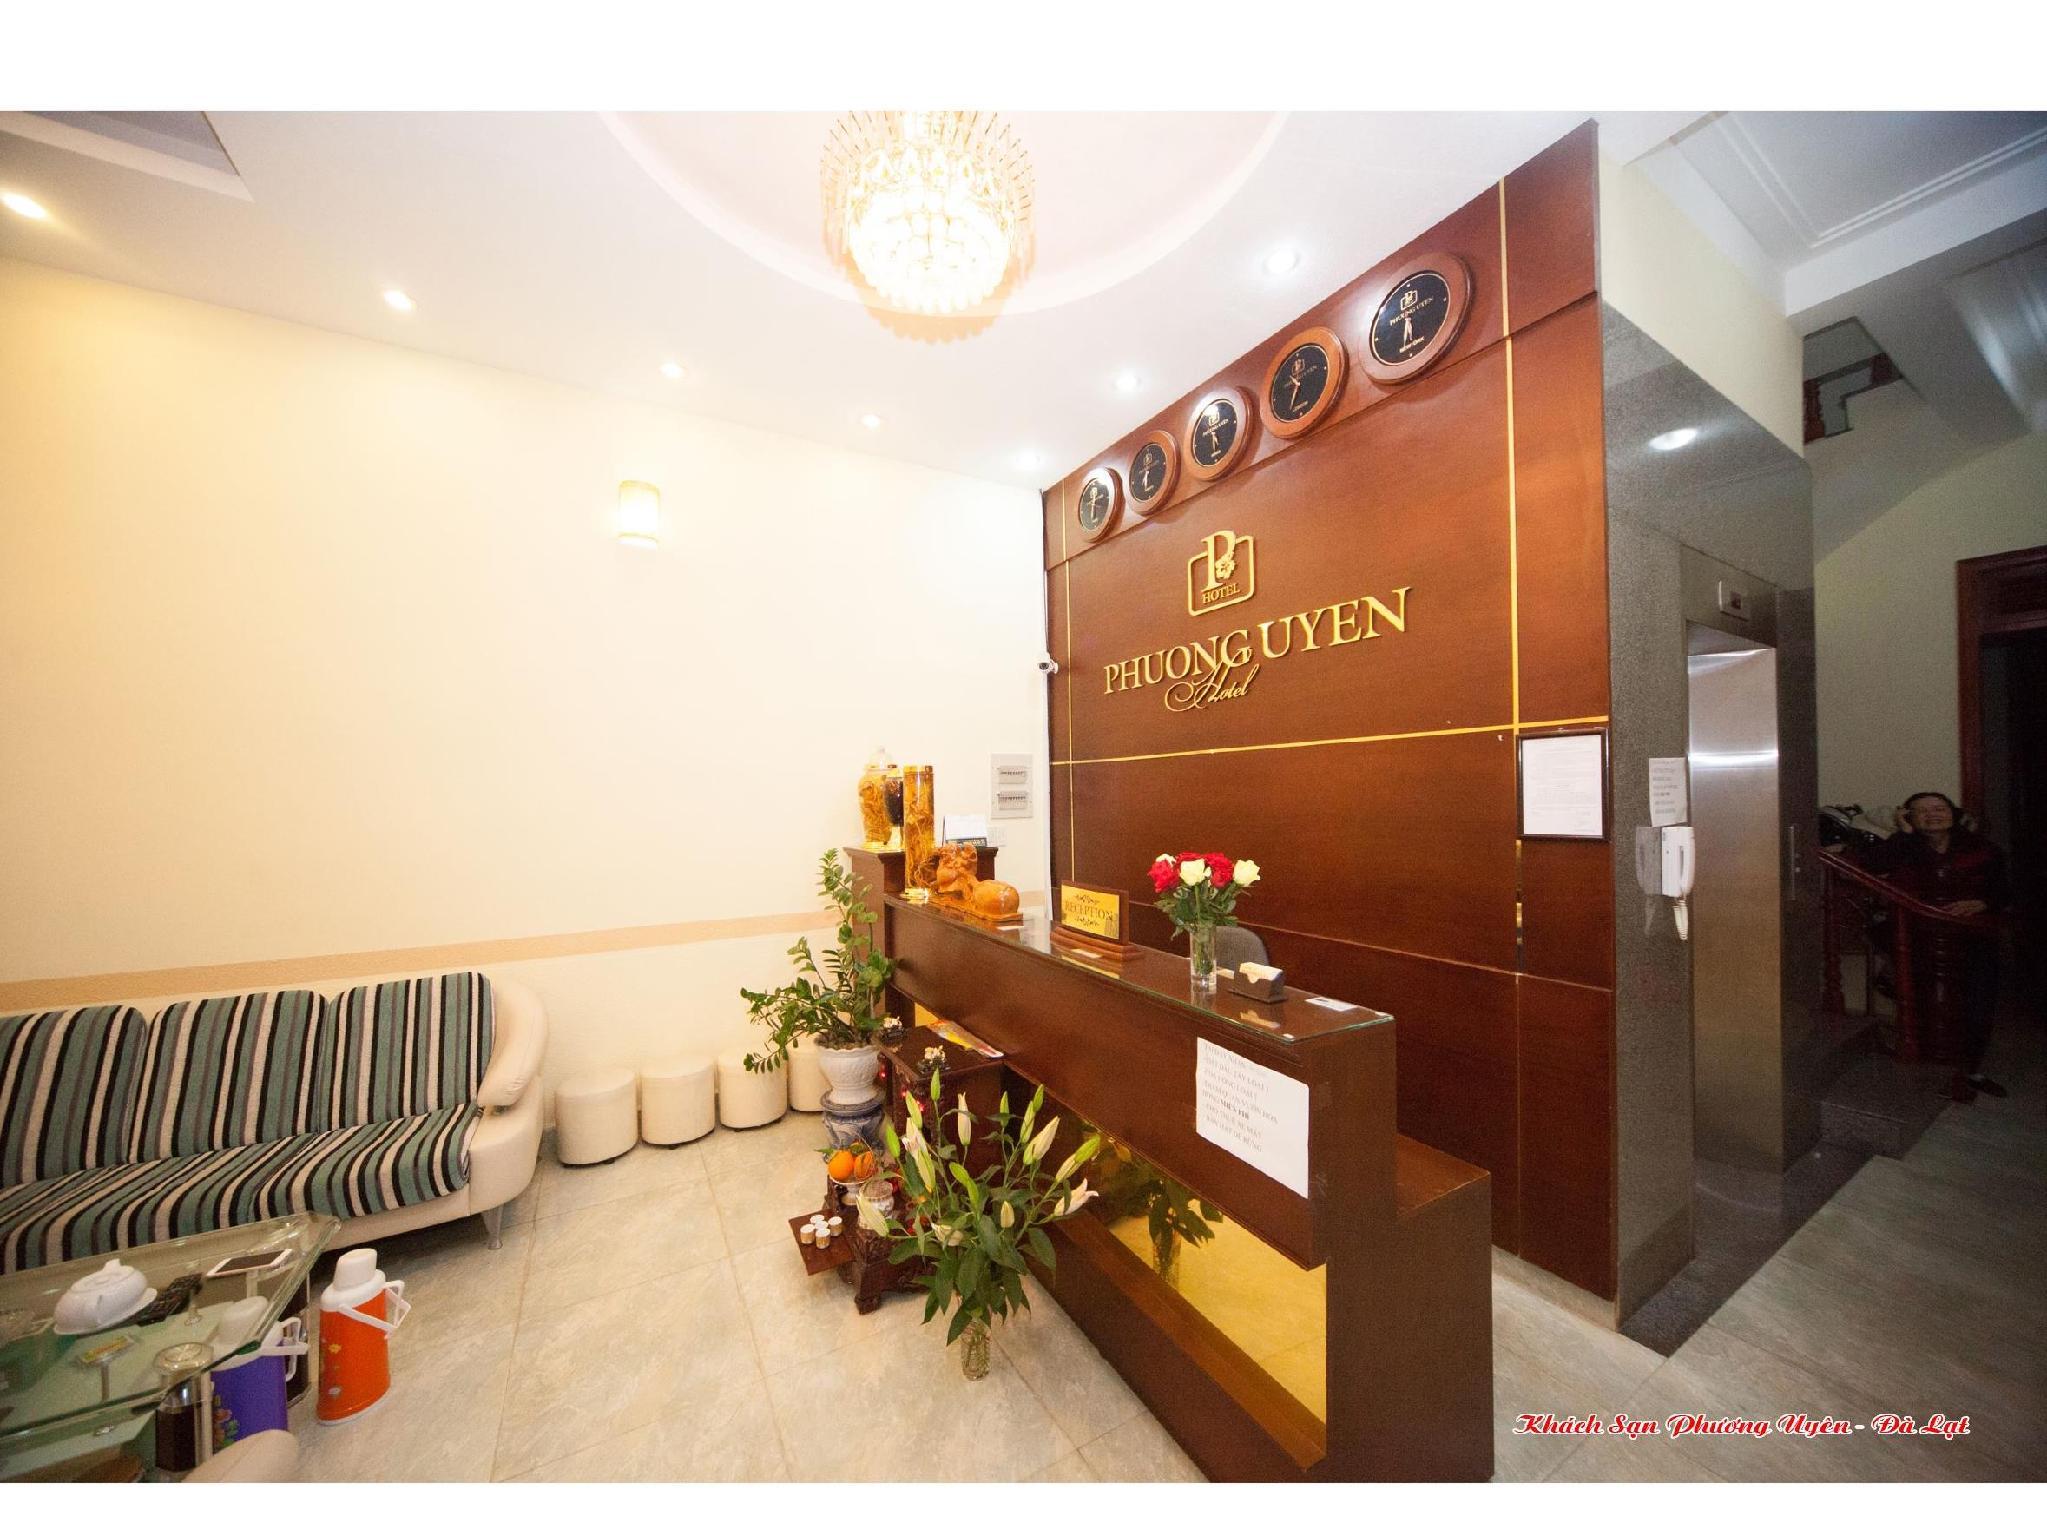 Phuong Uyen Dalat Hotel - Hotels and Accommodation in Vietnam, Asia